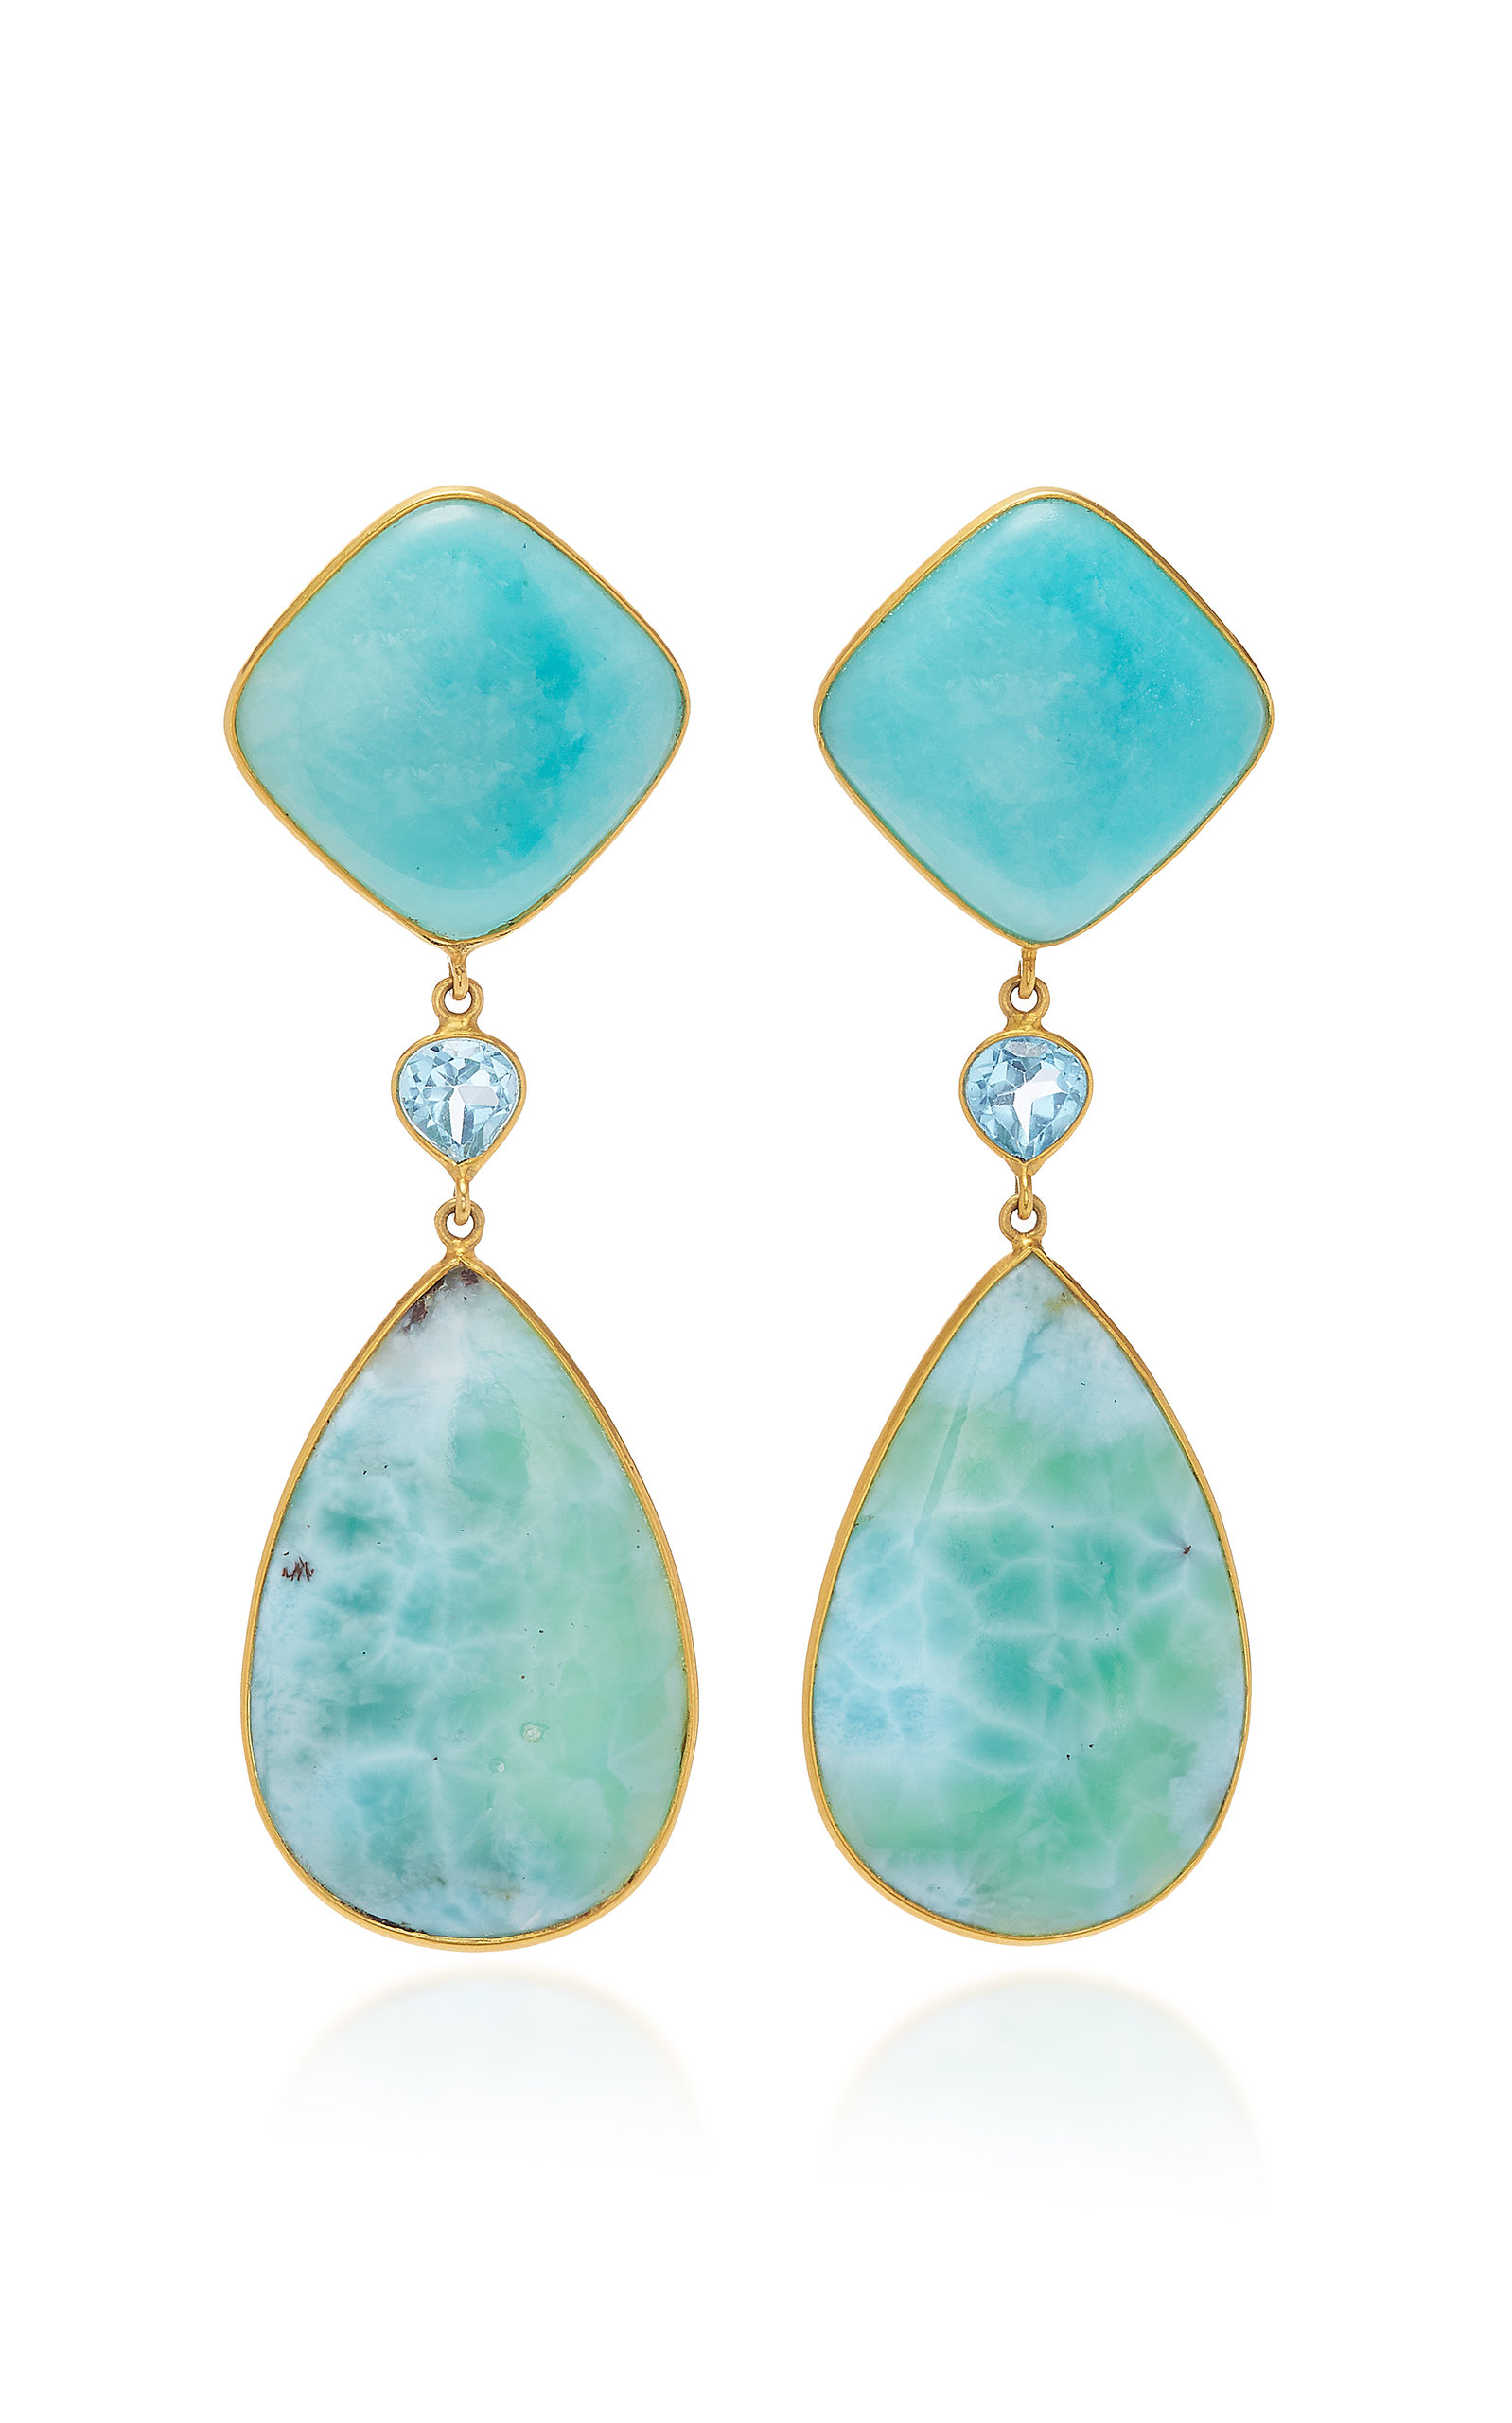 BAHINA 18K Gold Amazonite Topaz And Larimar Earrings in Blue